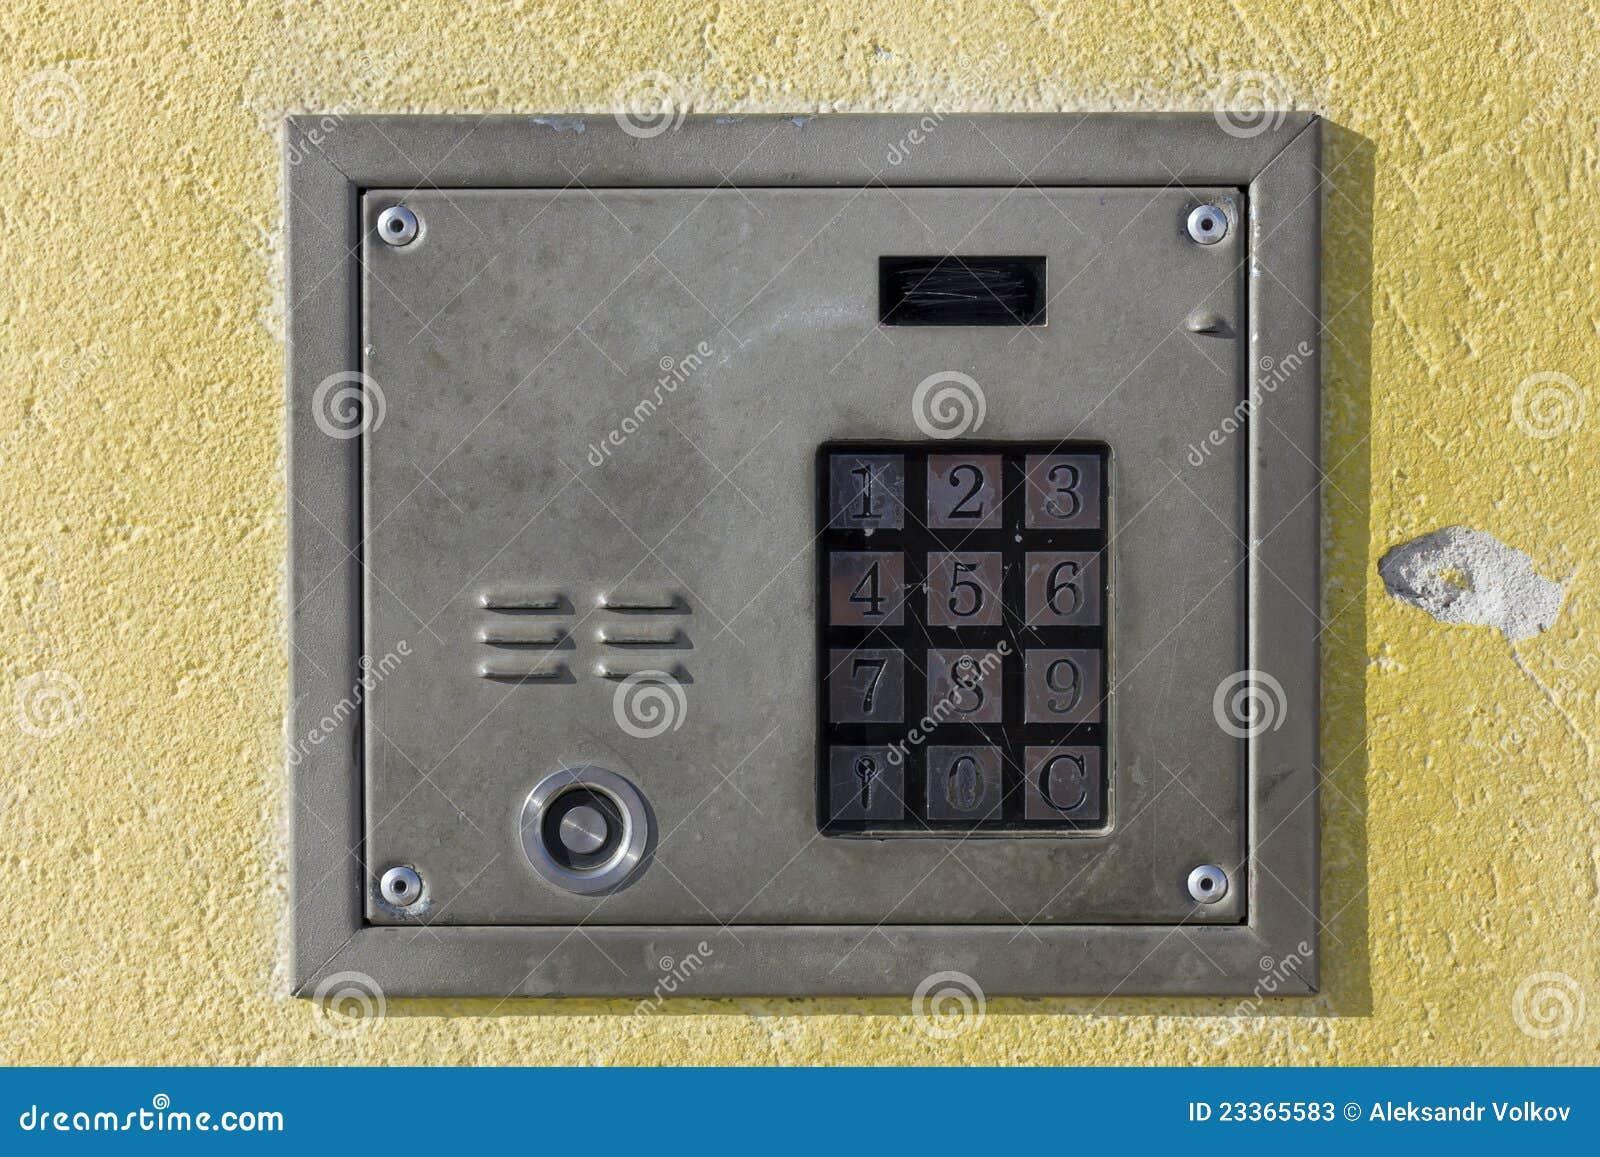 Old Door Lock With Numeric Keypad Stock Photos Image